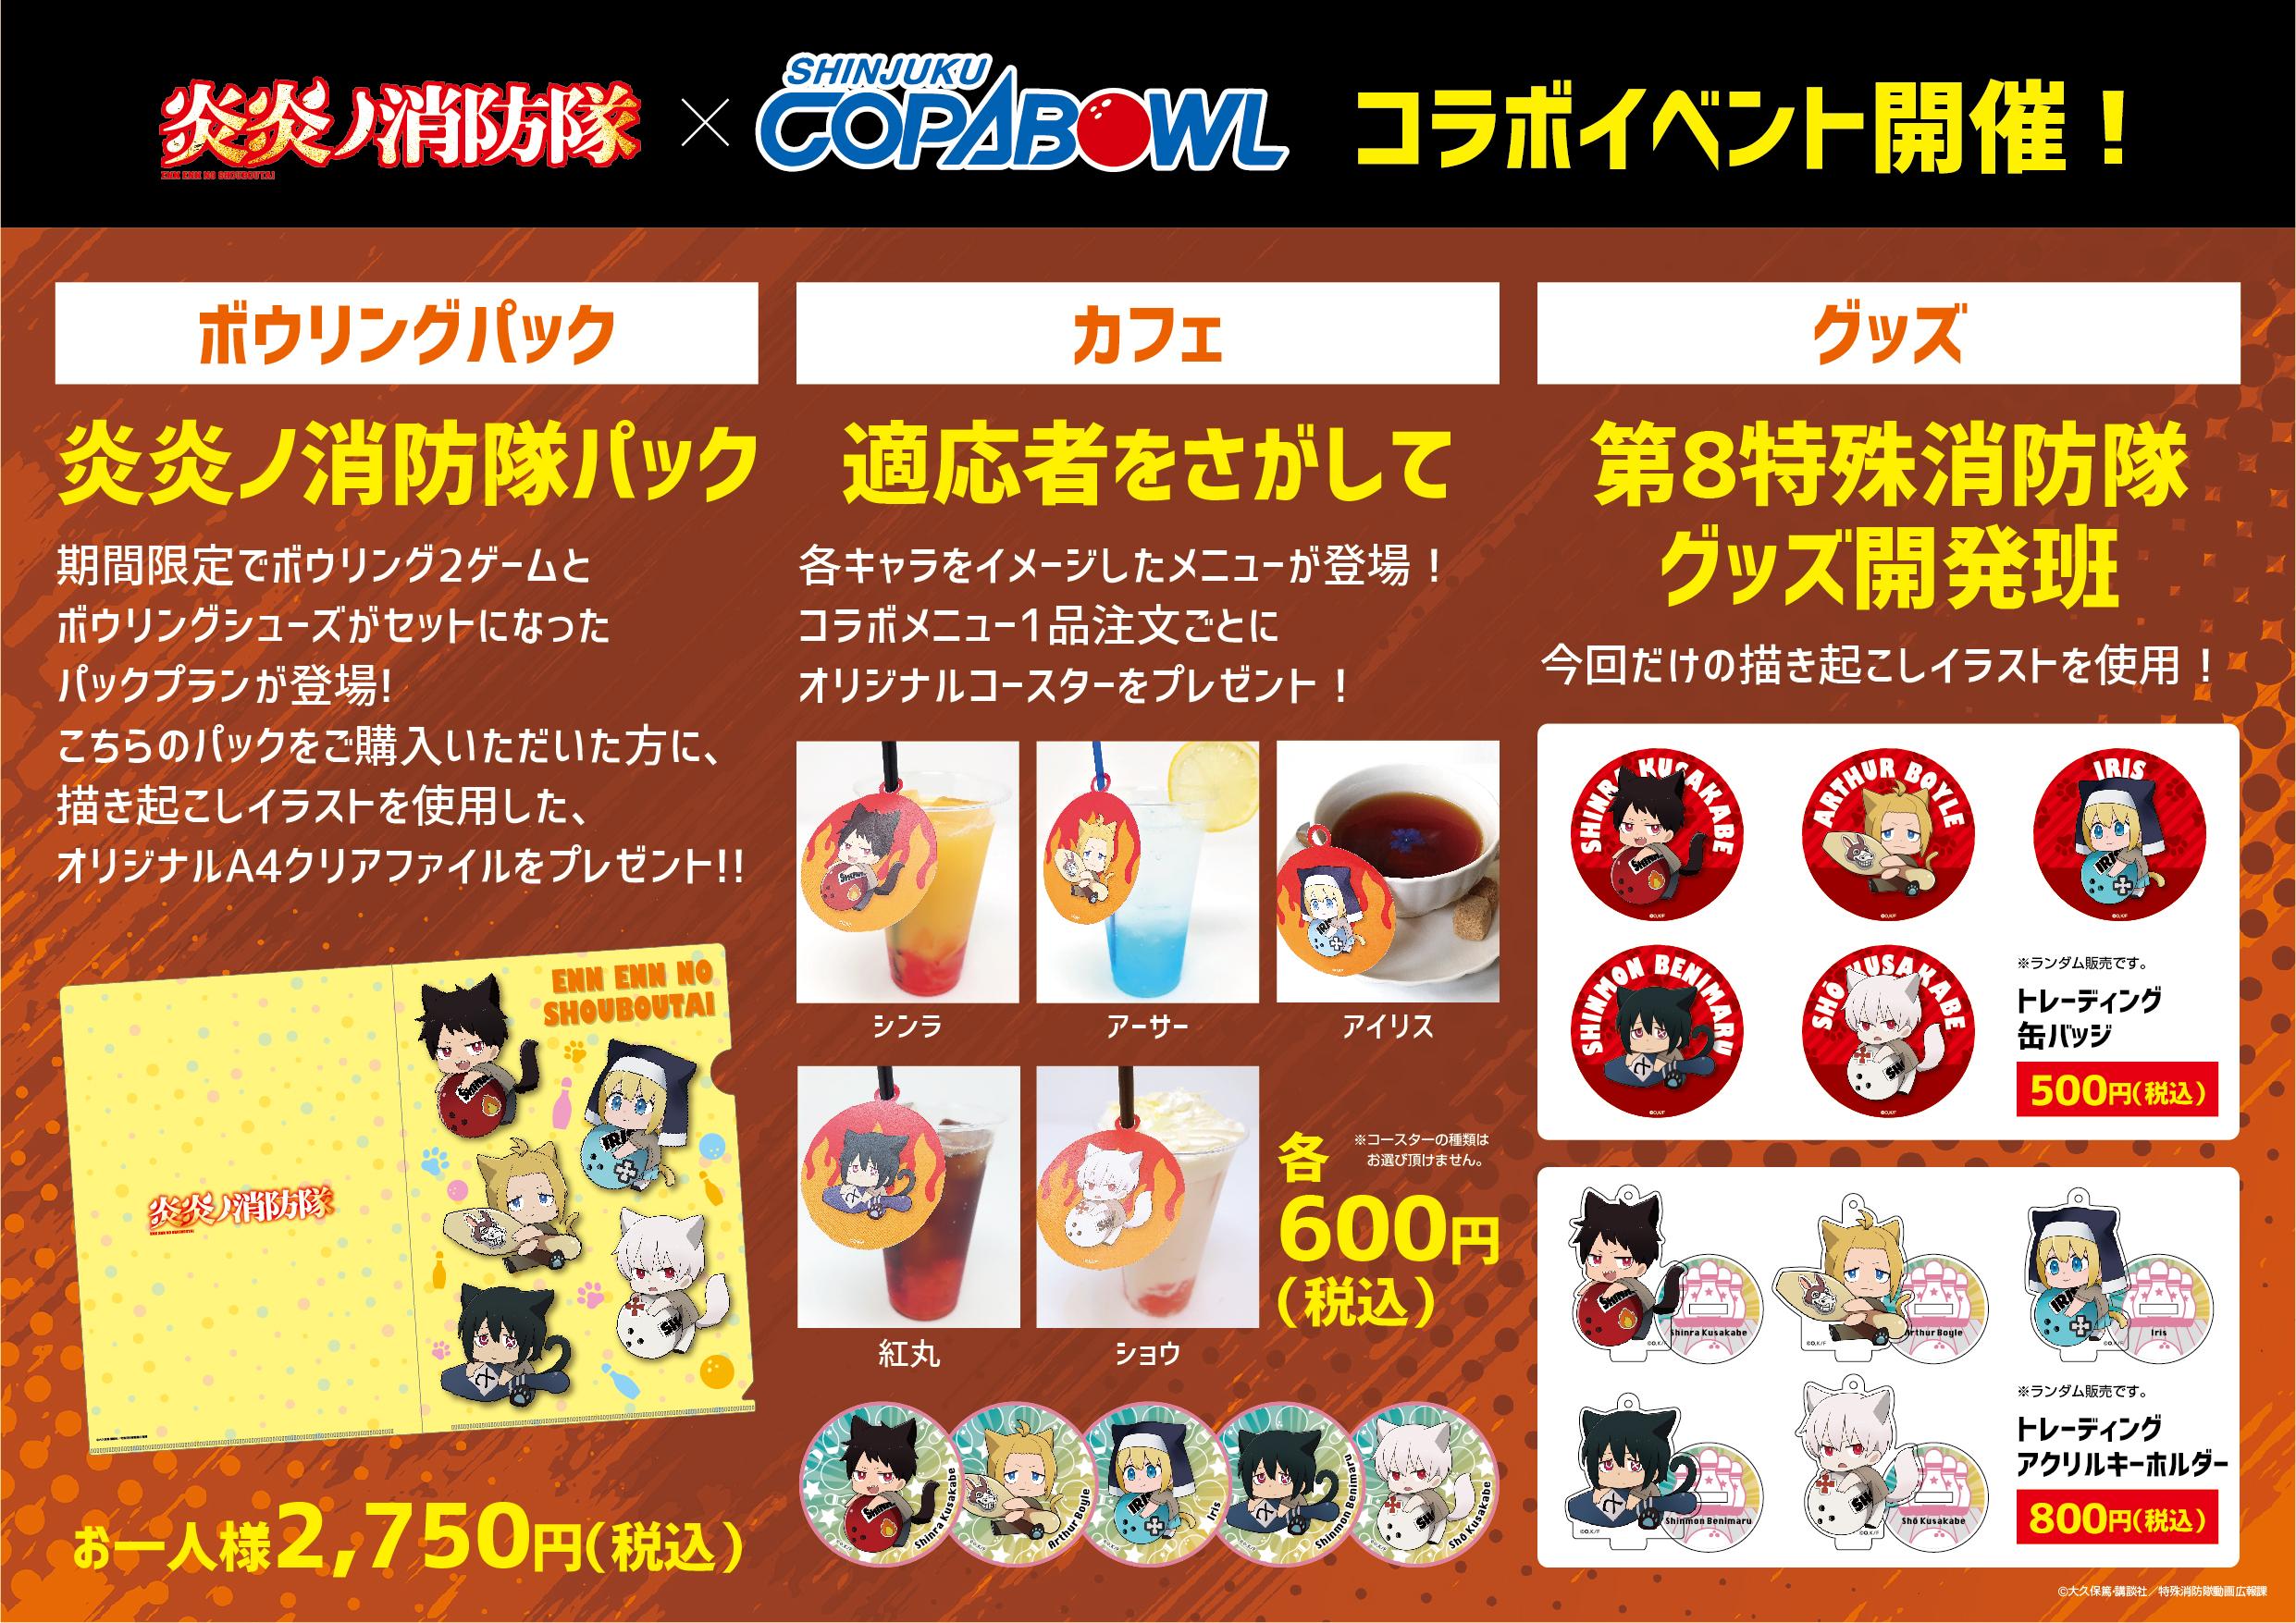 TVアニメ「炎炎ノ消防隊」コラボイベント新宿コパボウル